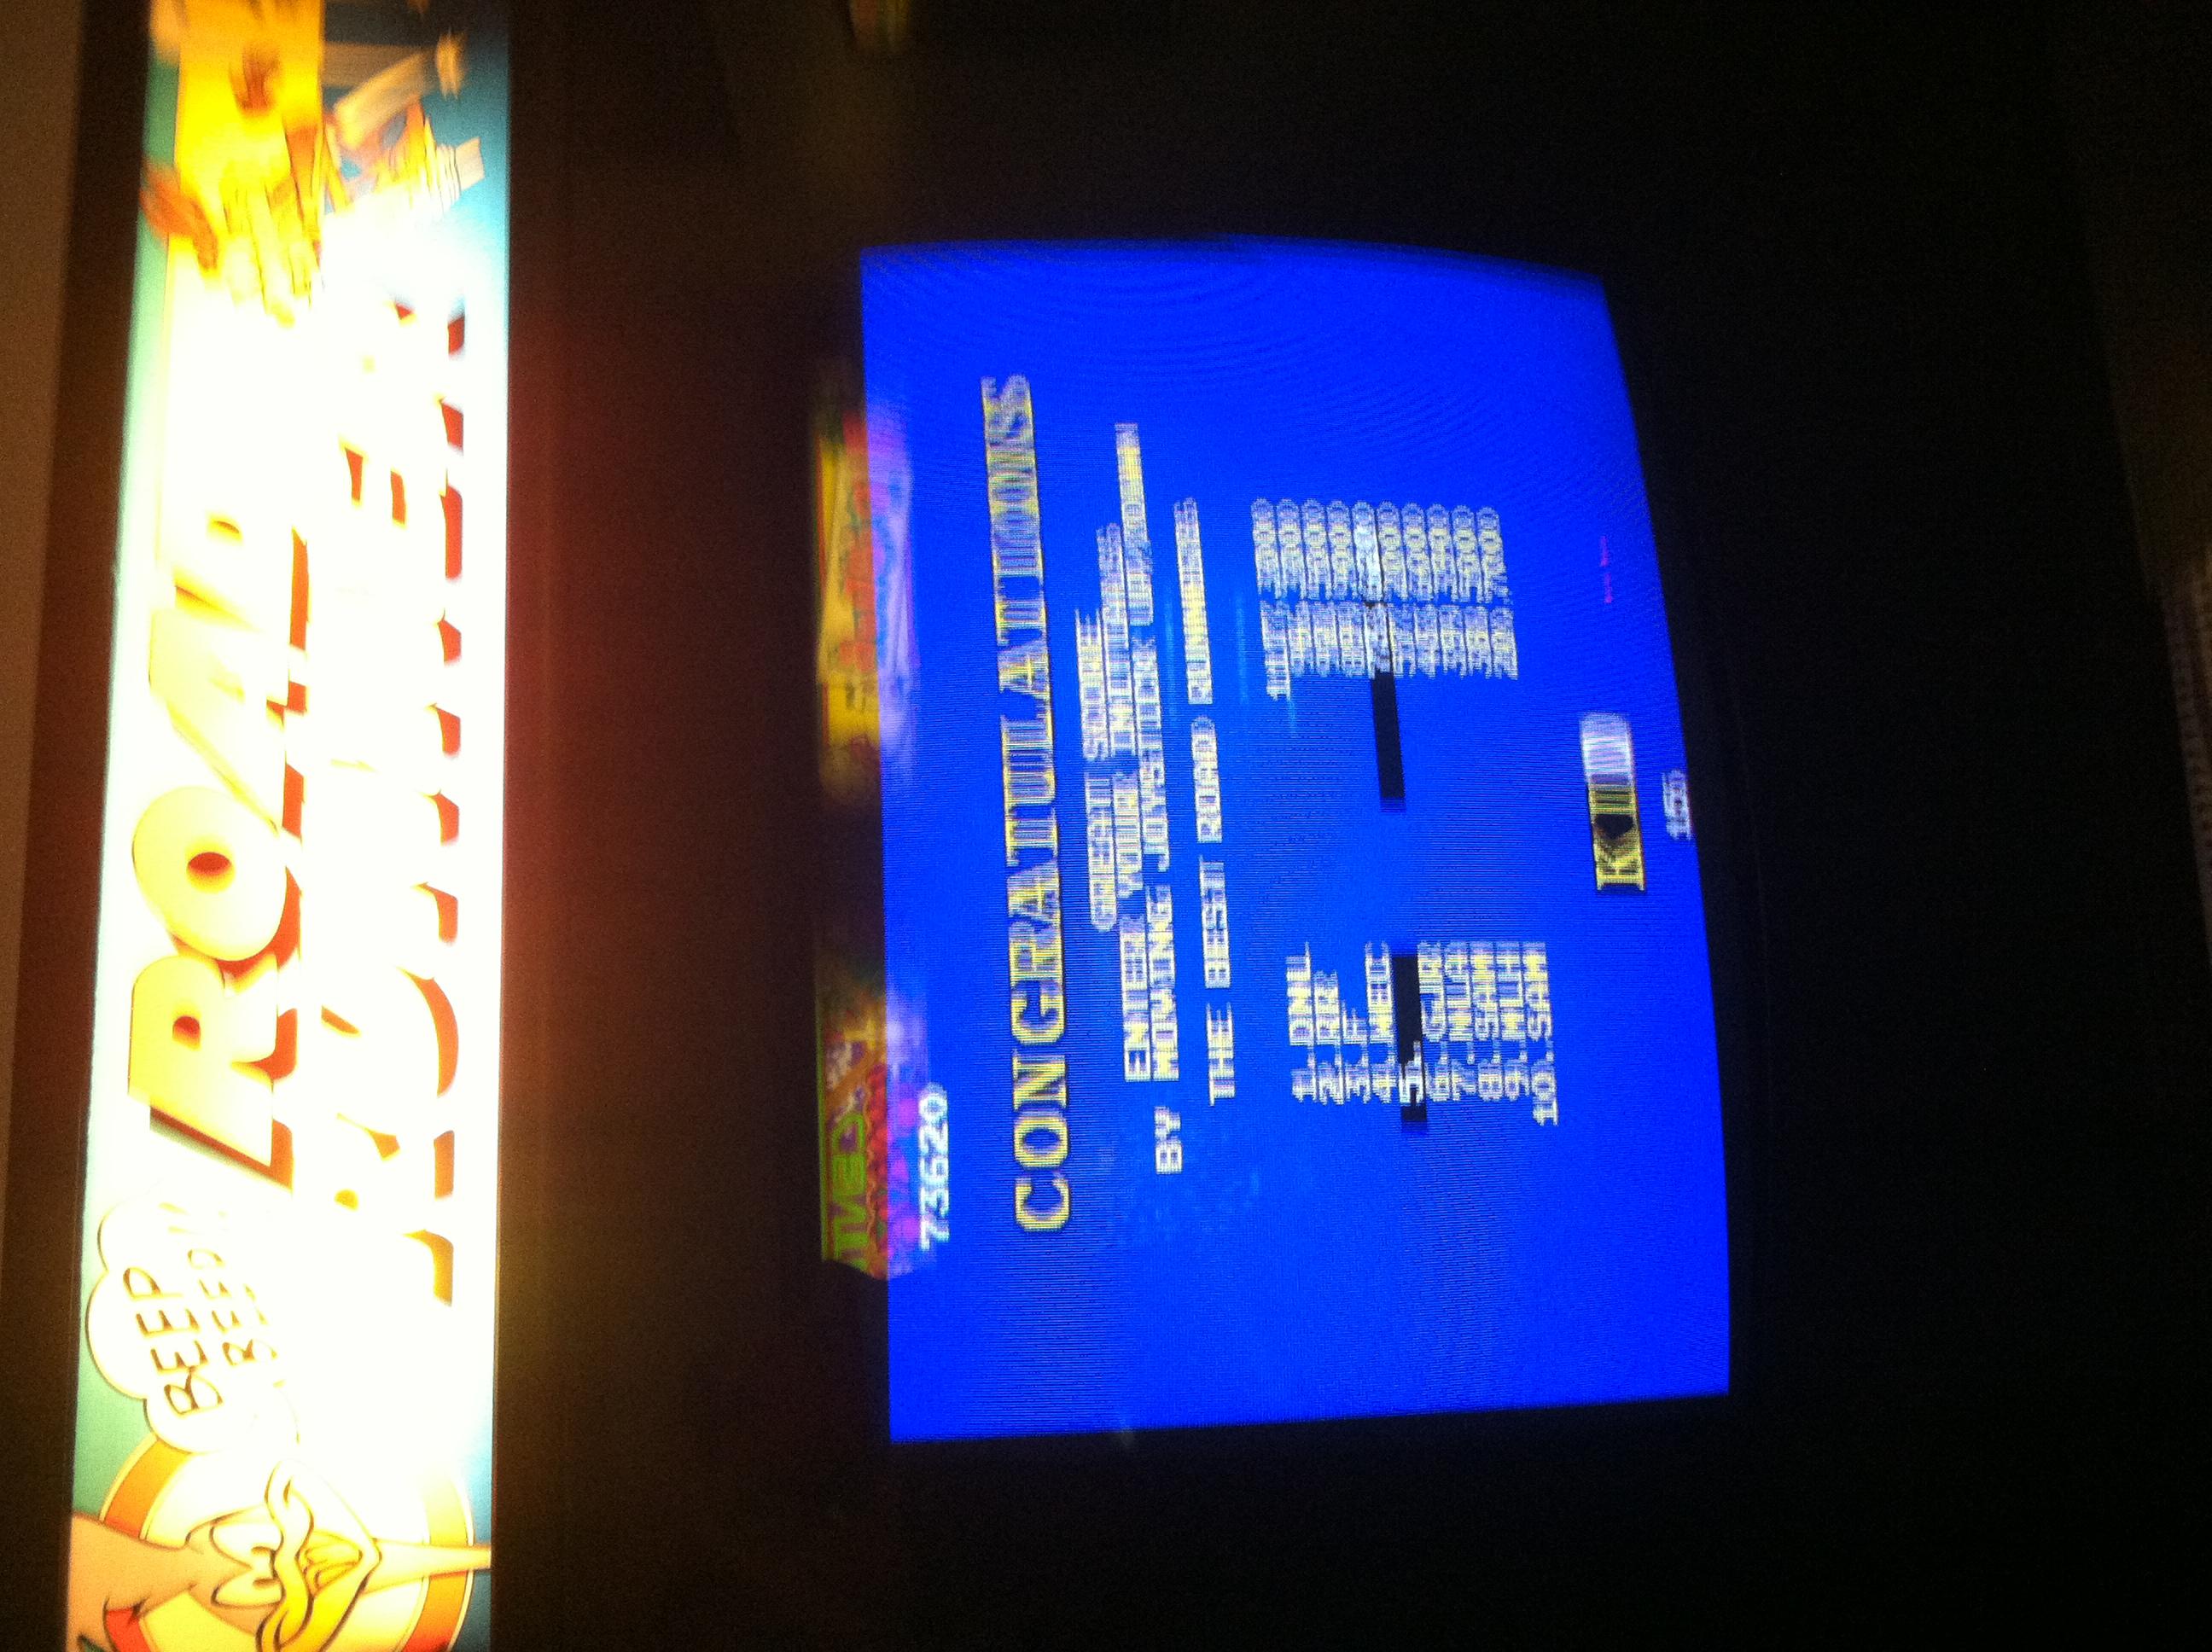 DakotaKid: Road Runner (Arcade) 73,620 points on 2019-02-22 23:06:31